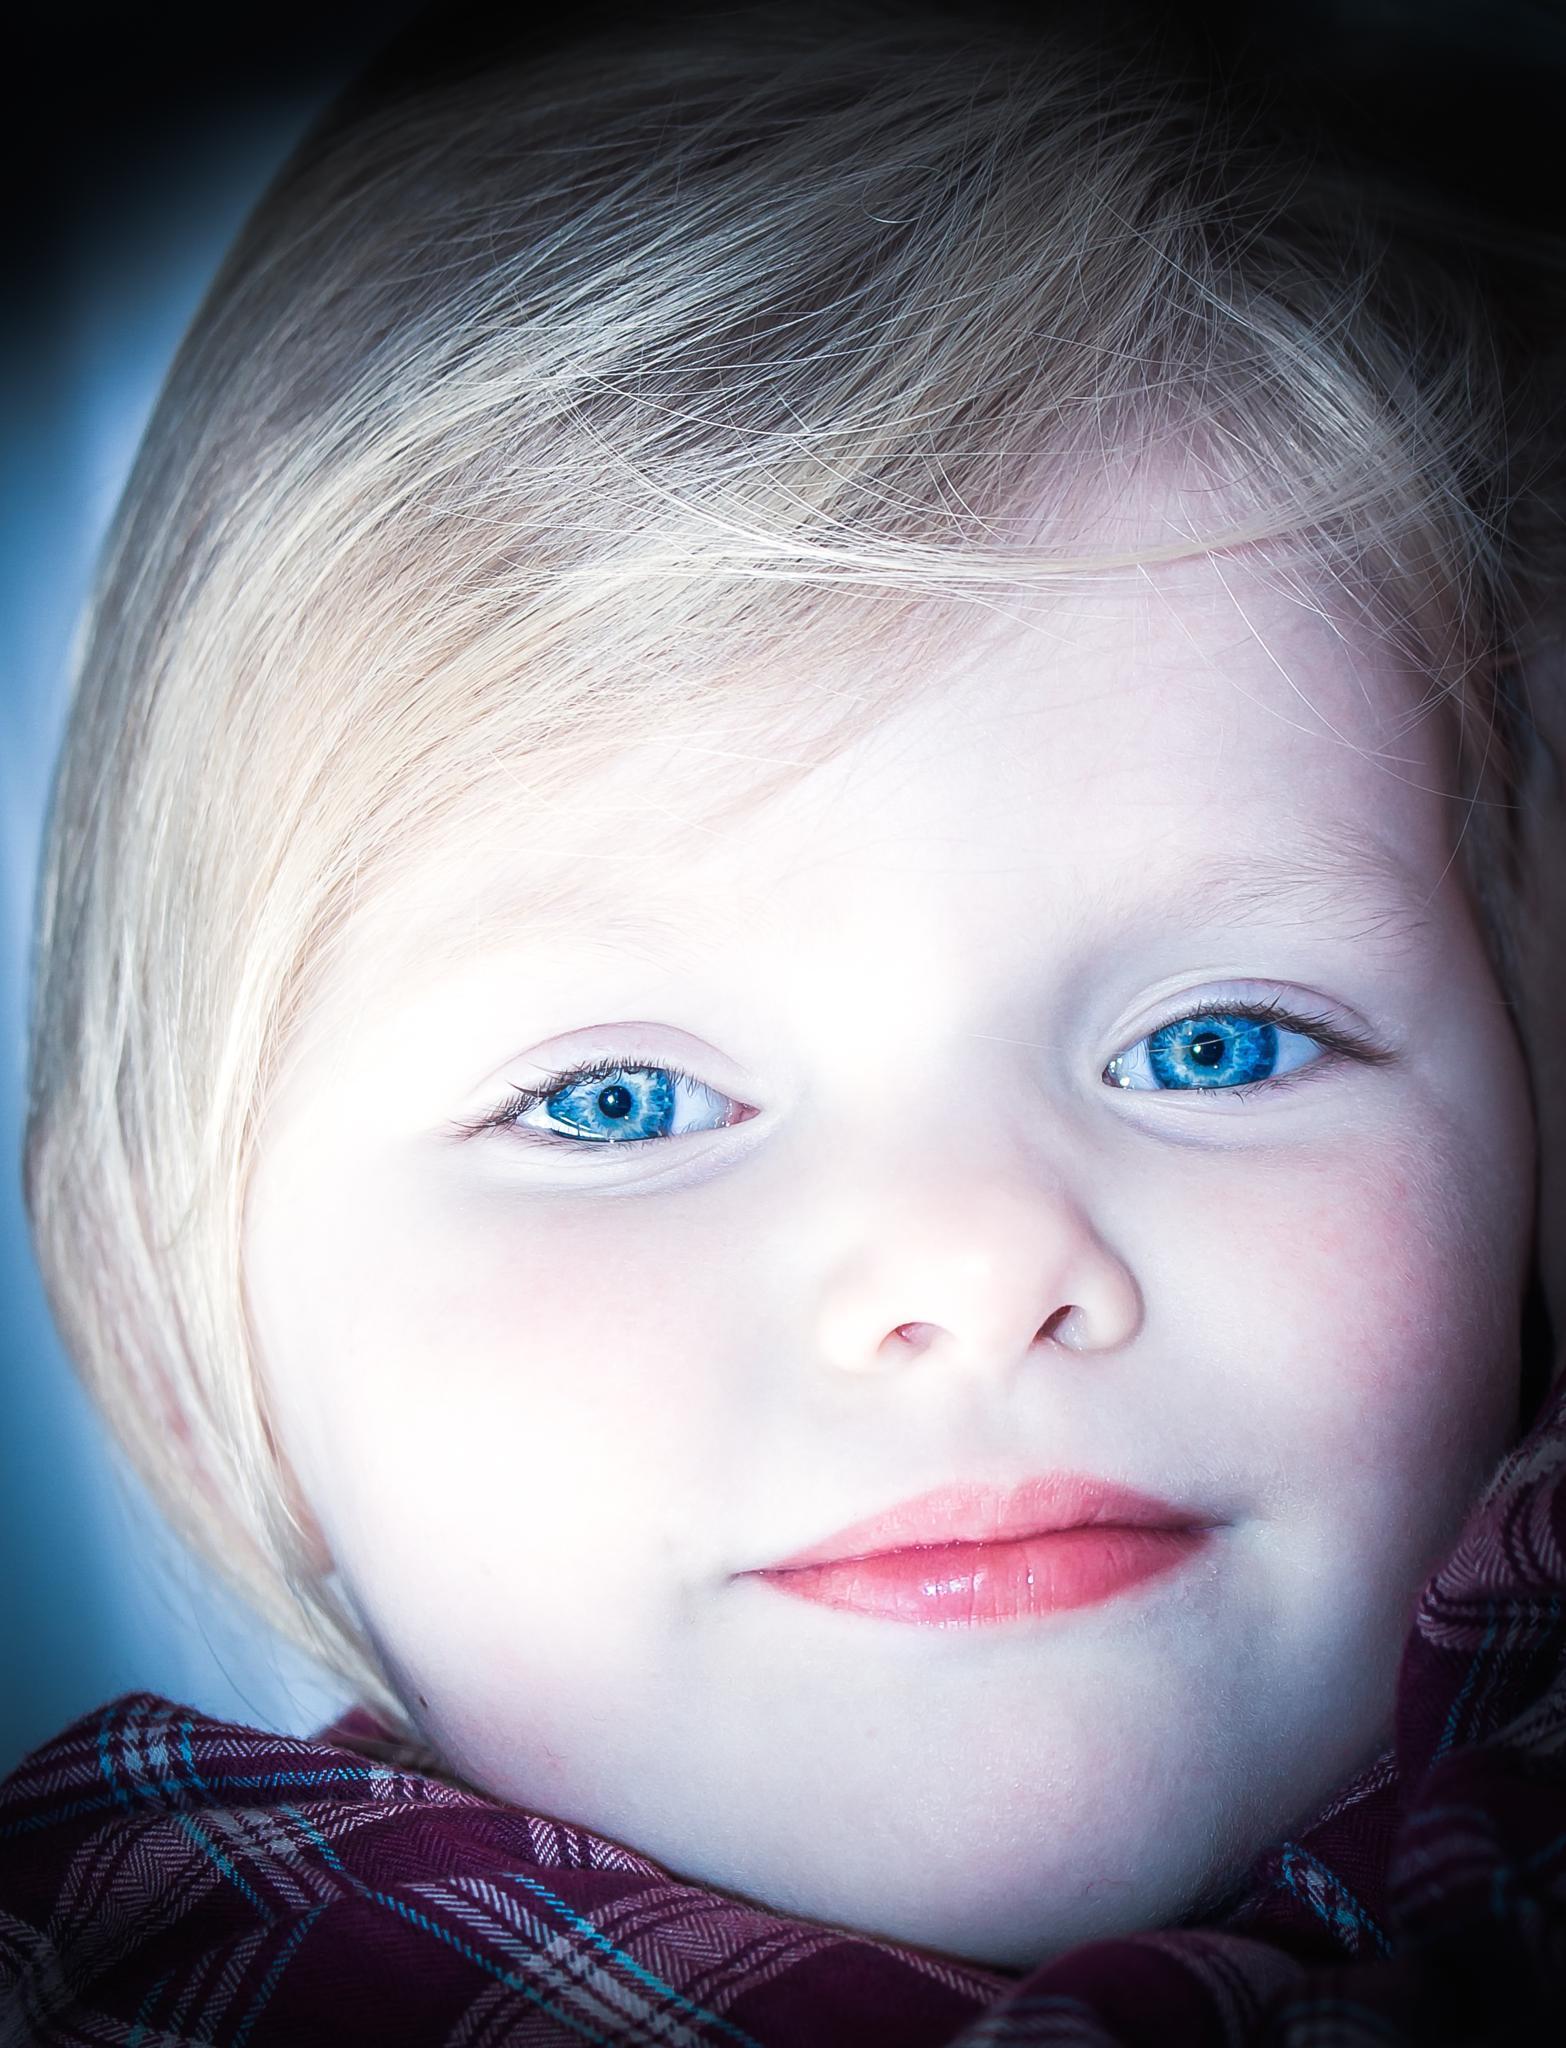 blue eyes by eam19